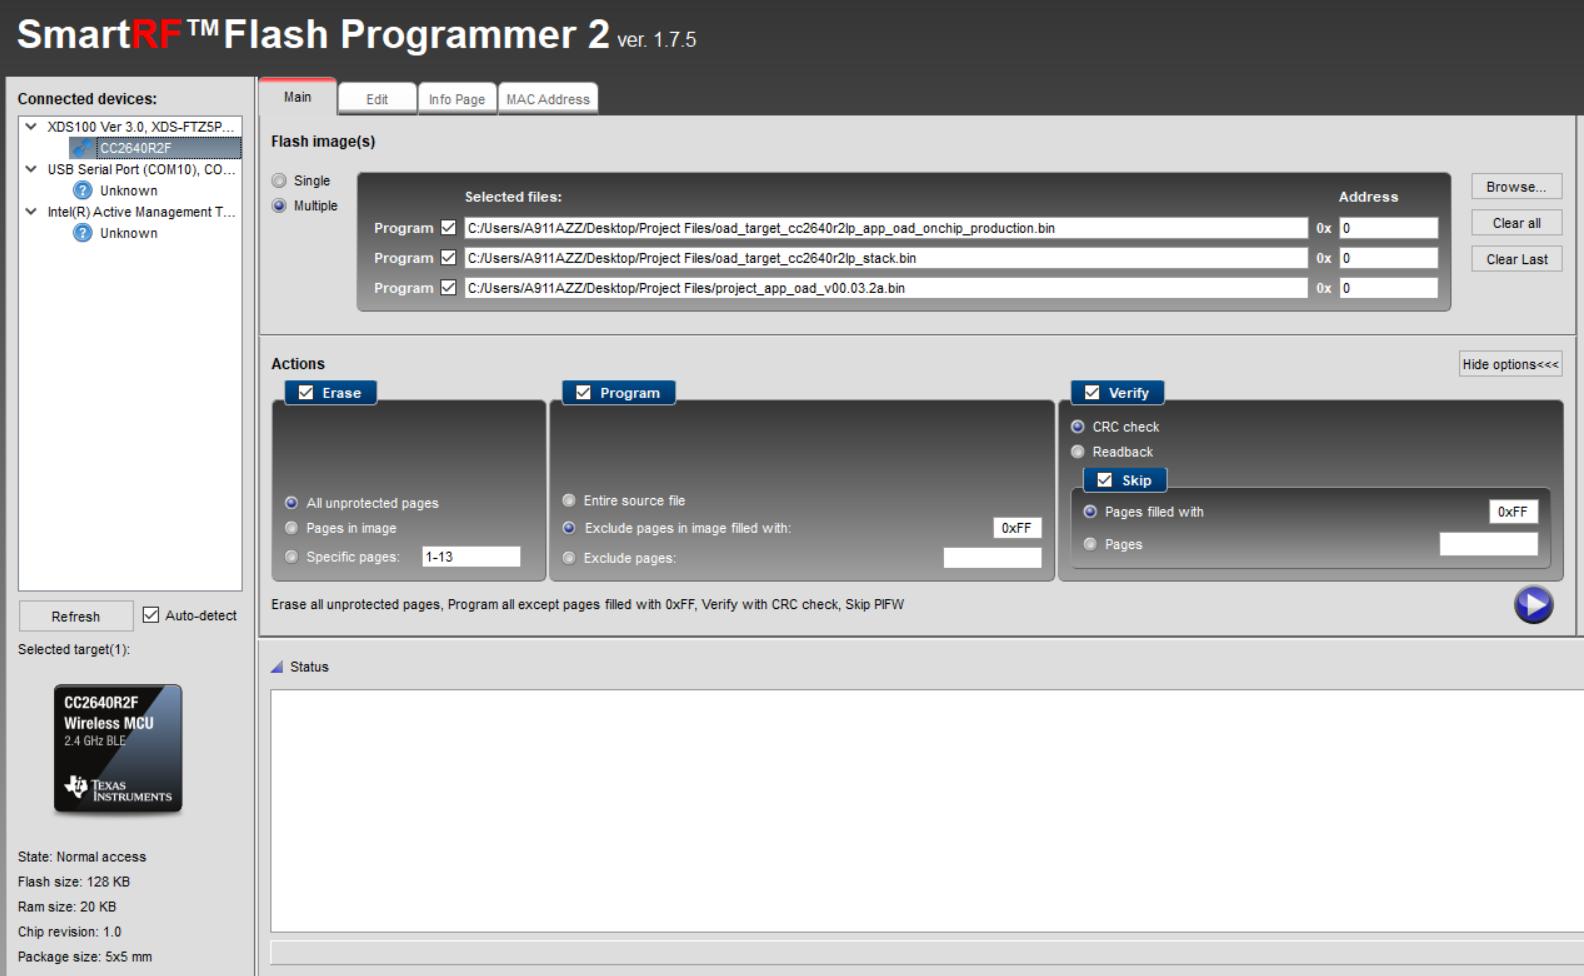 CC2640R2F: Programming BIM, stack and app via Flash